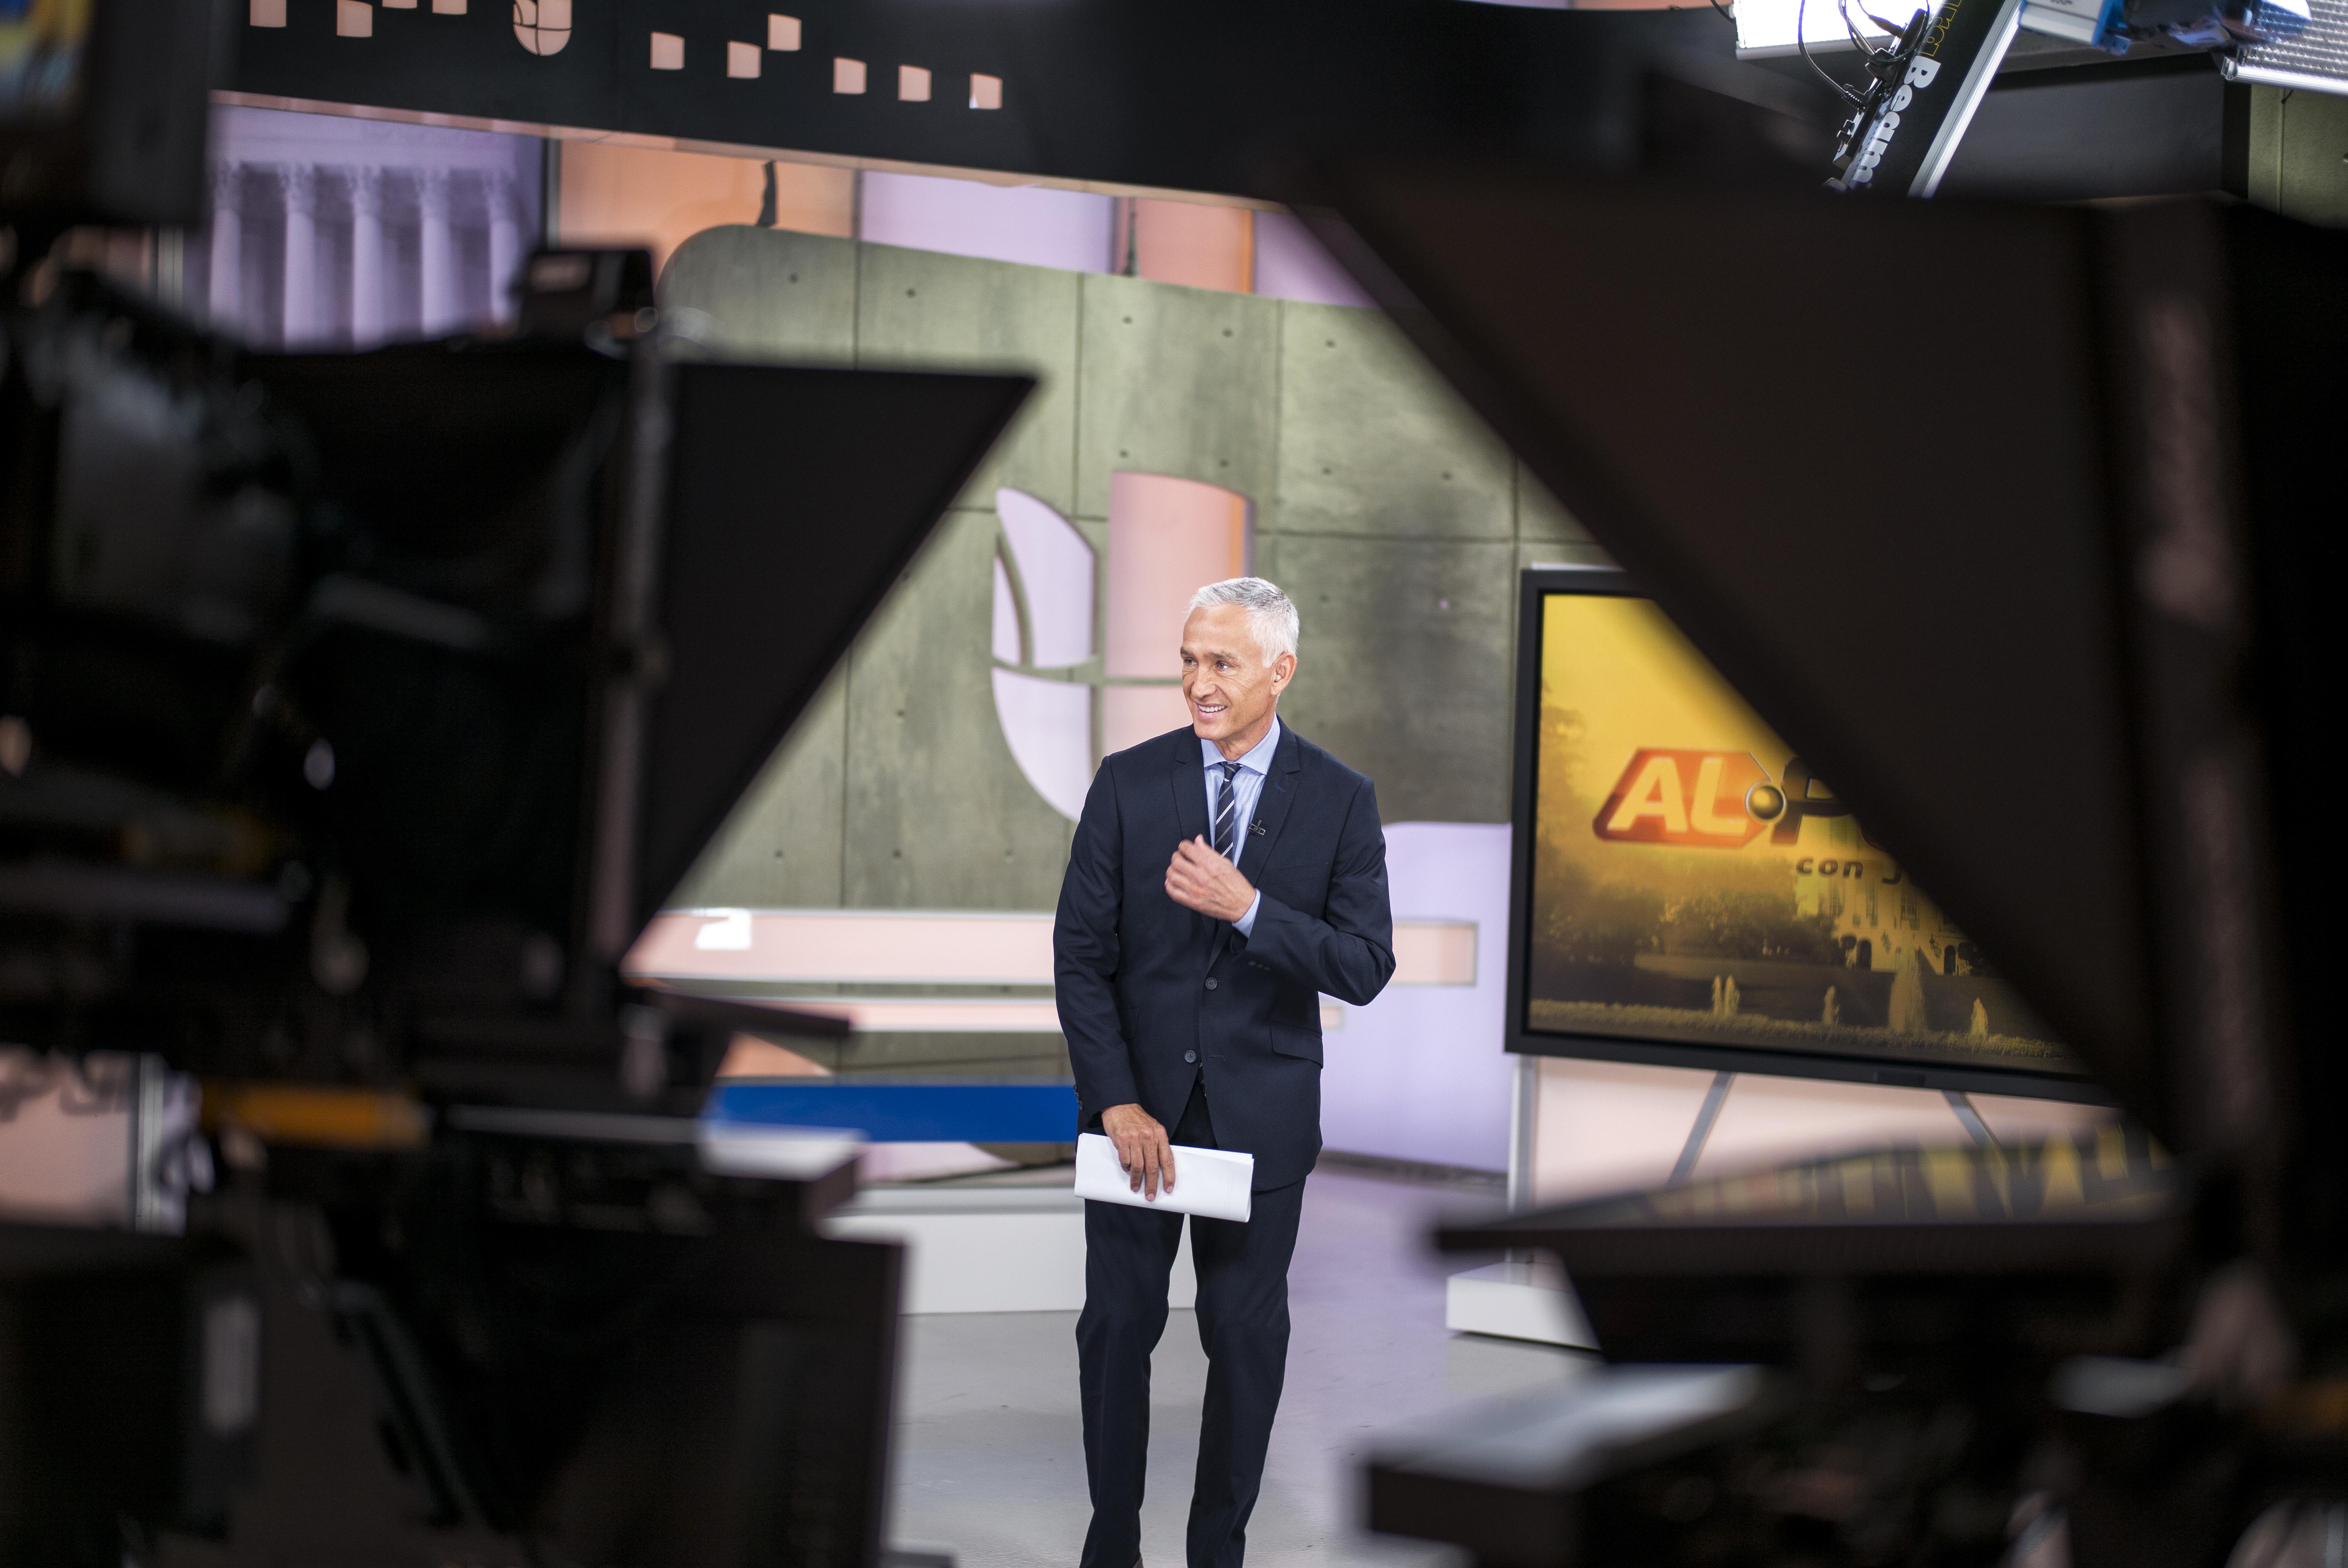 Univision News Anchor Jorge Ramos